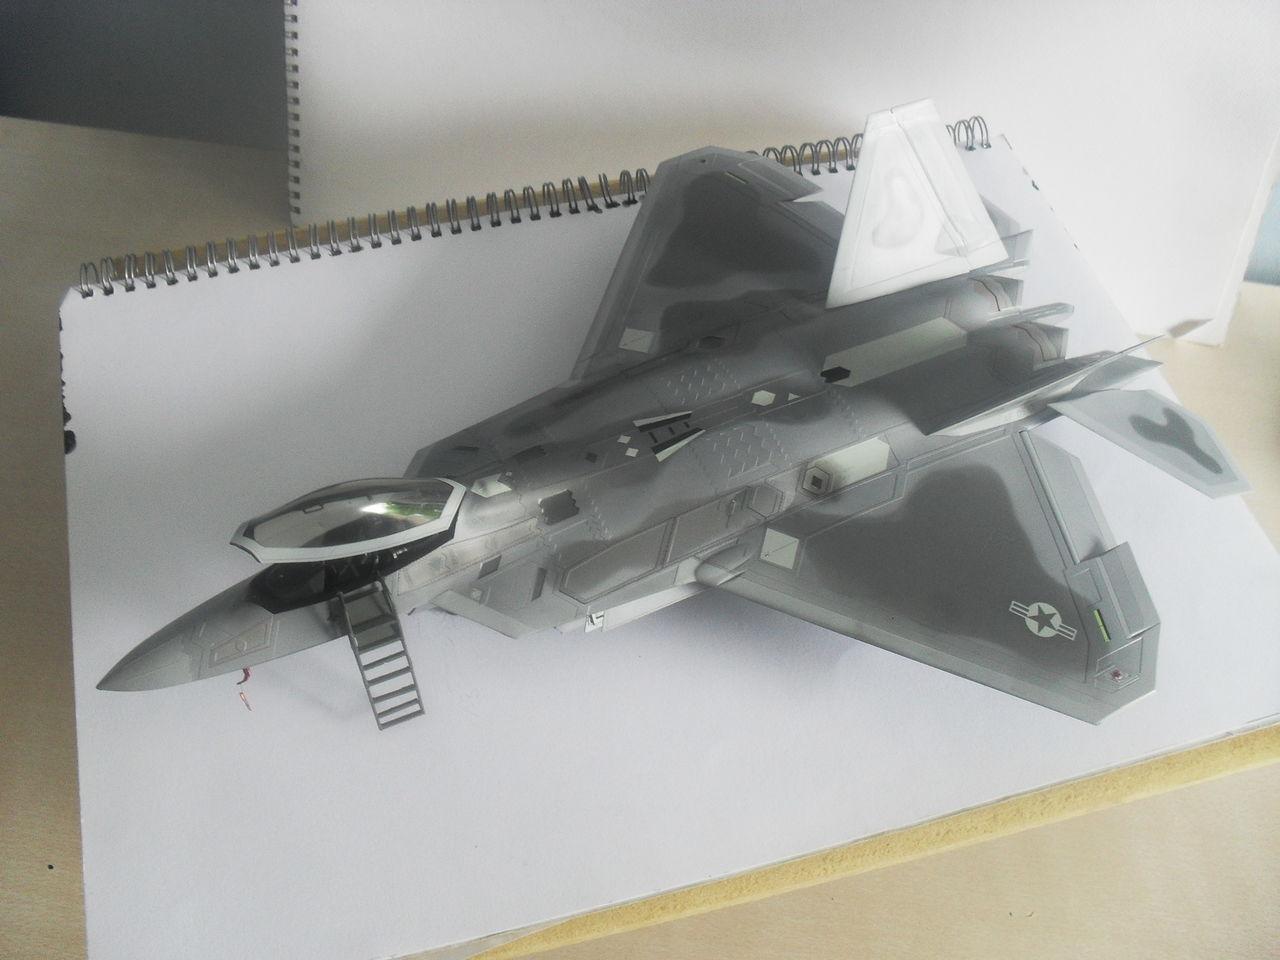 "F/A-22A  1/48  Hasegawa...""σε οσους αρεσουμε, για τους αλλους δεν θα μπορεσουμε!!!"" SDC13384"